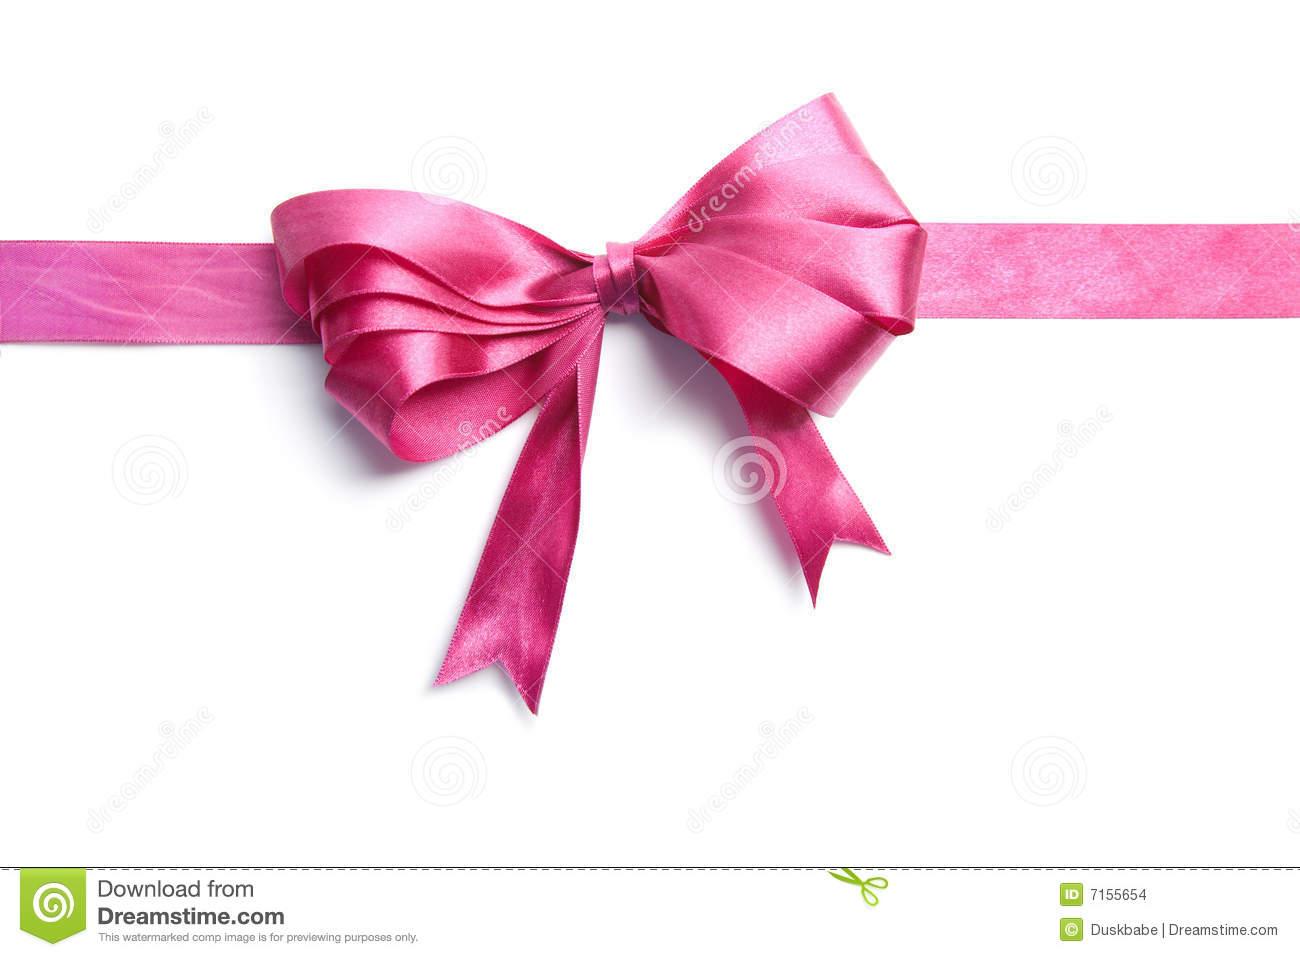 pink-gift-ribbon